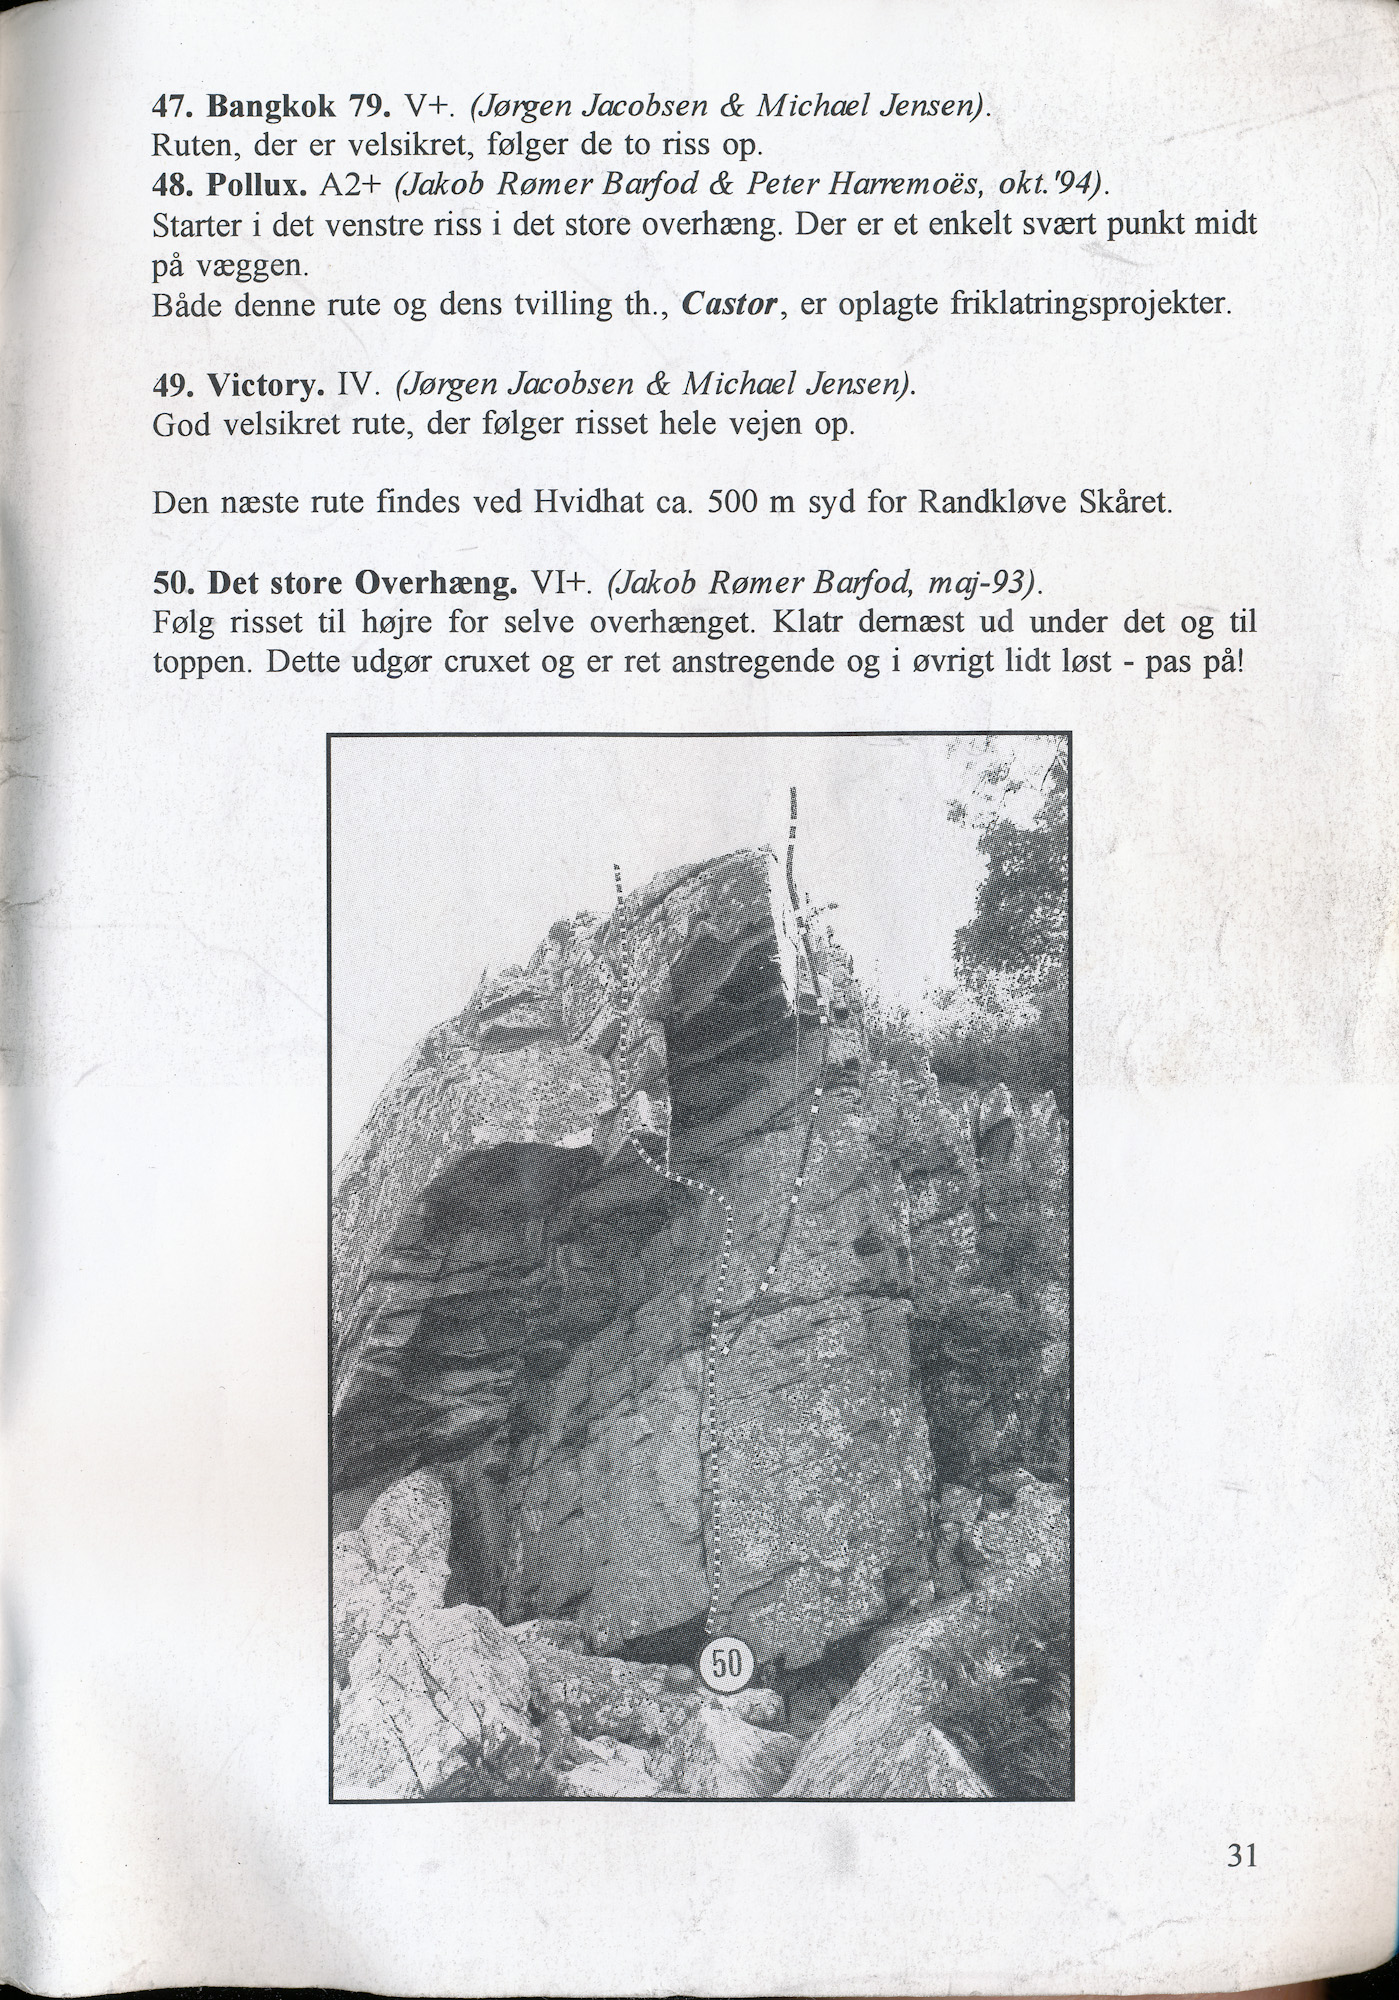 50 udvalgte ruter paa bornholm 1995 31.jpg